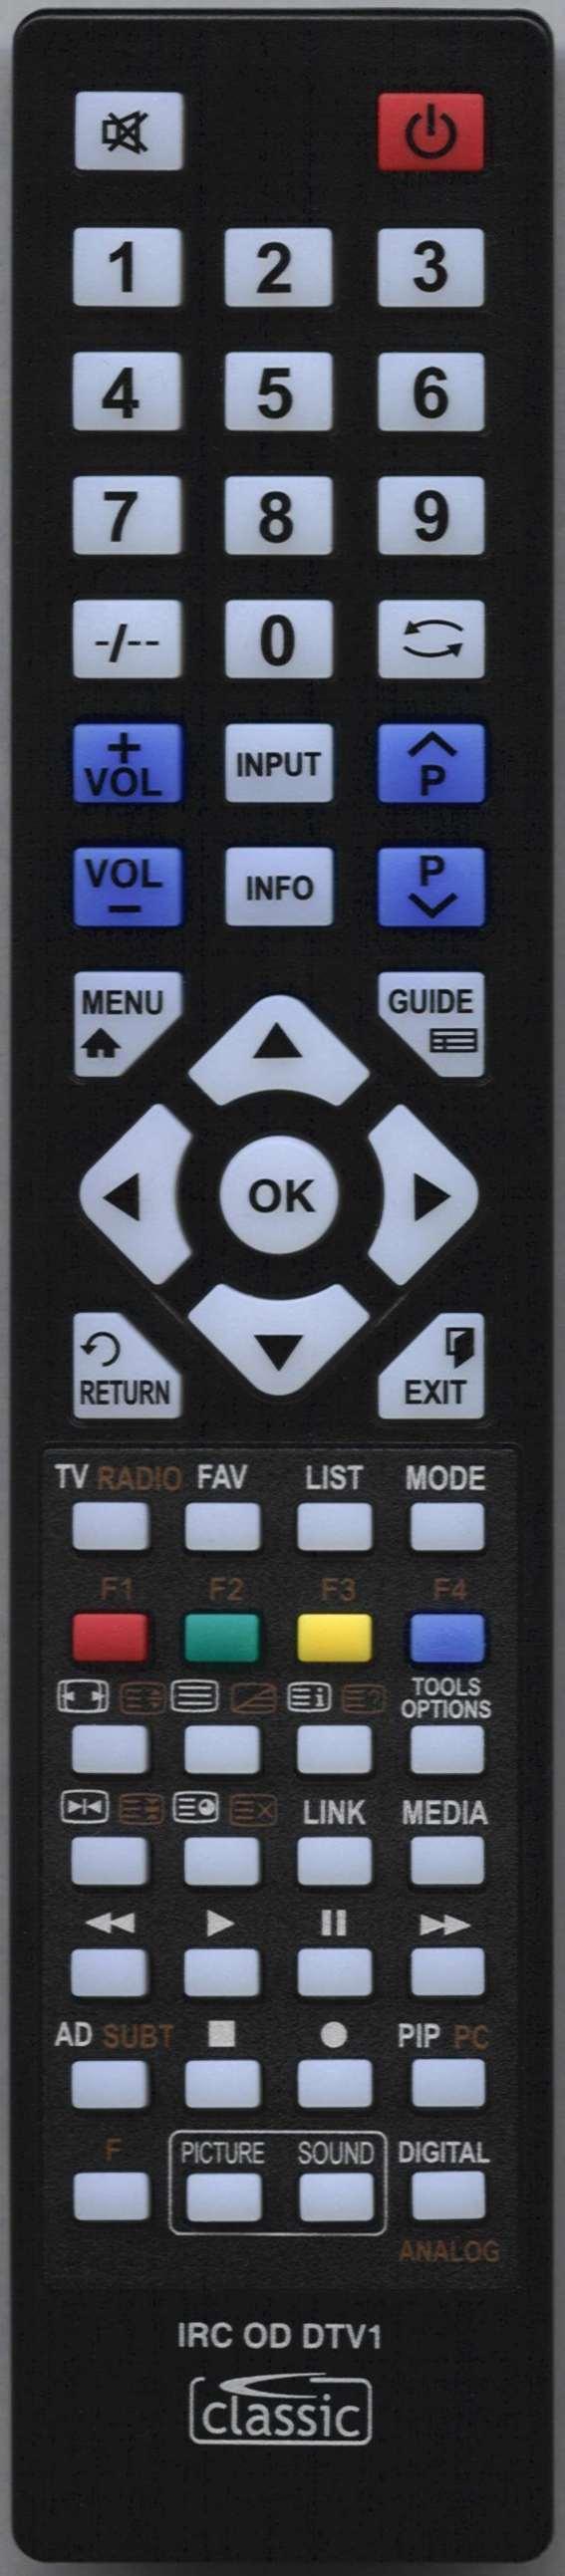 JVC LT-43C795 Remote Control